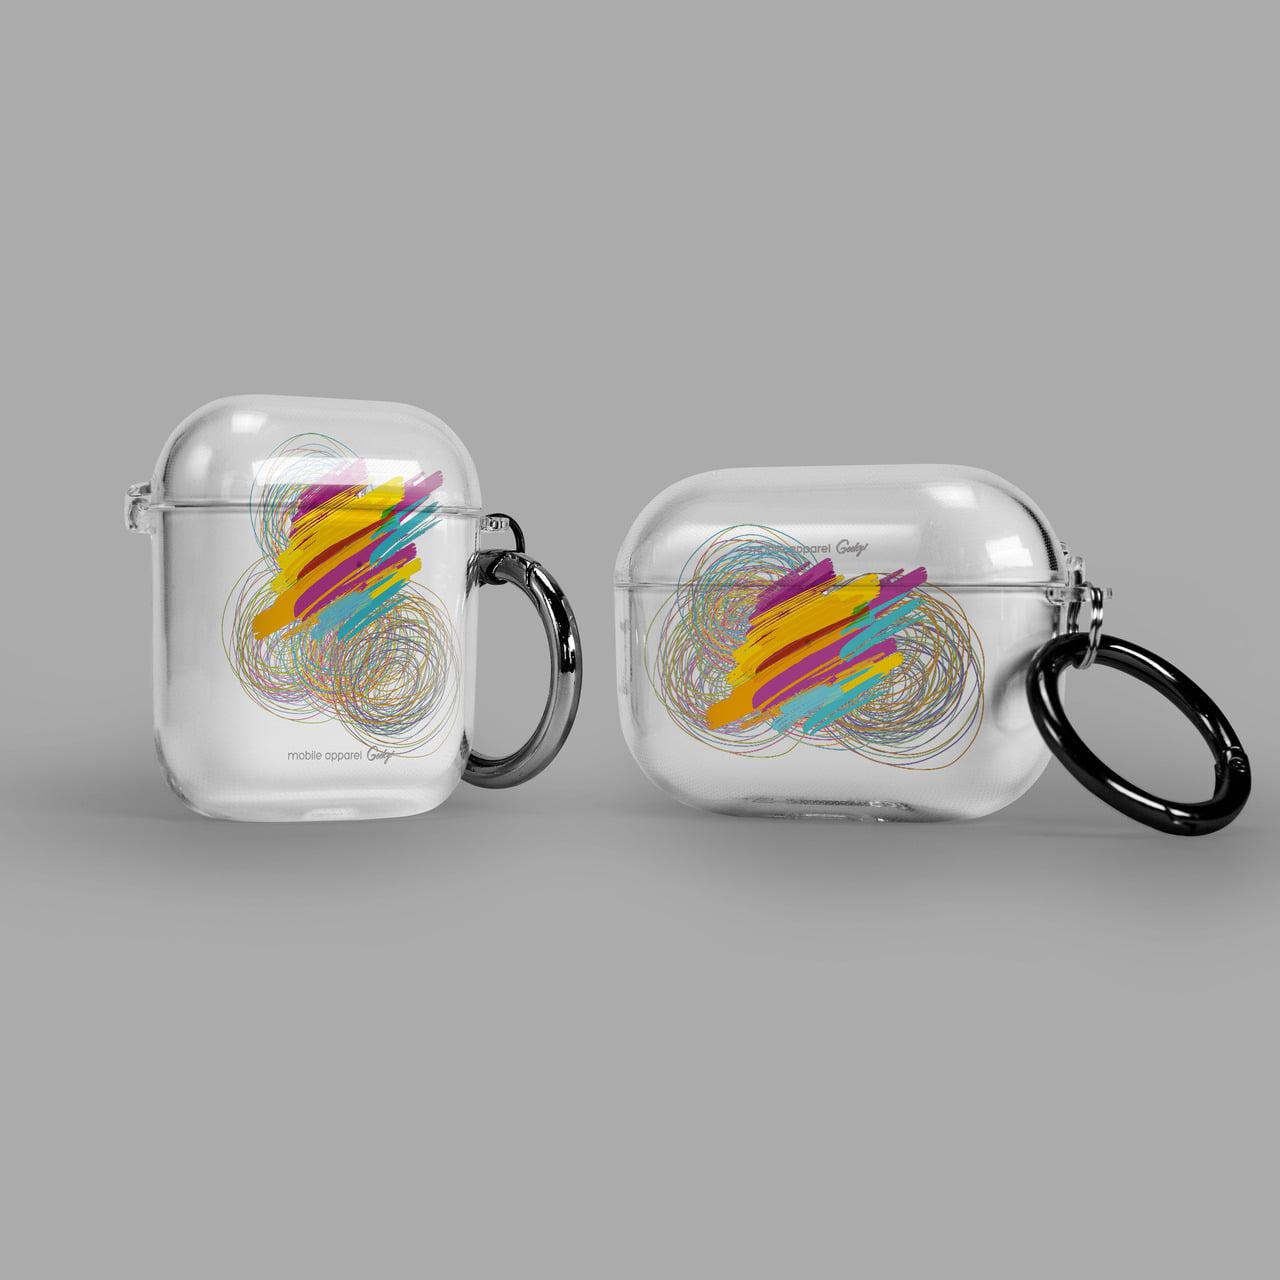 [Airpods cases] Urban3 No.03